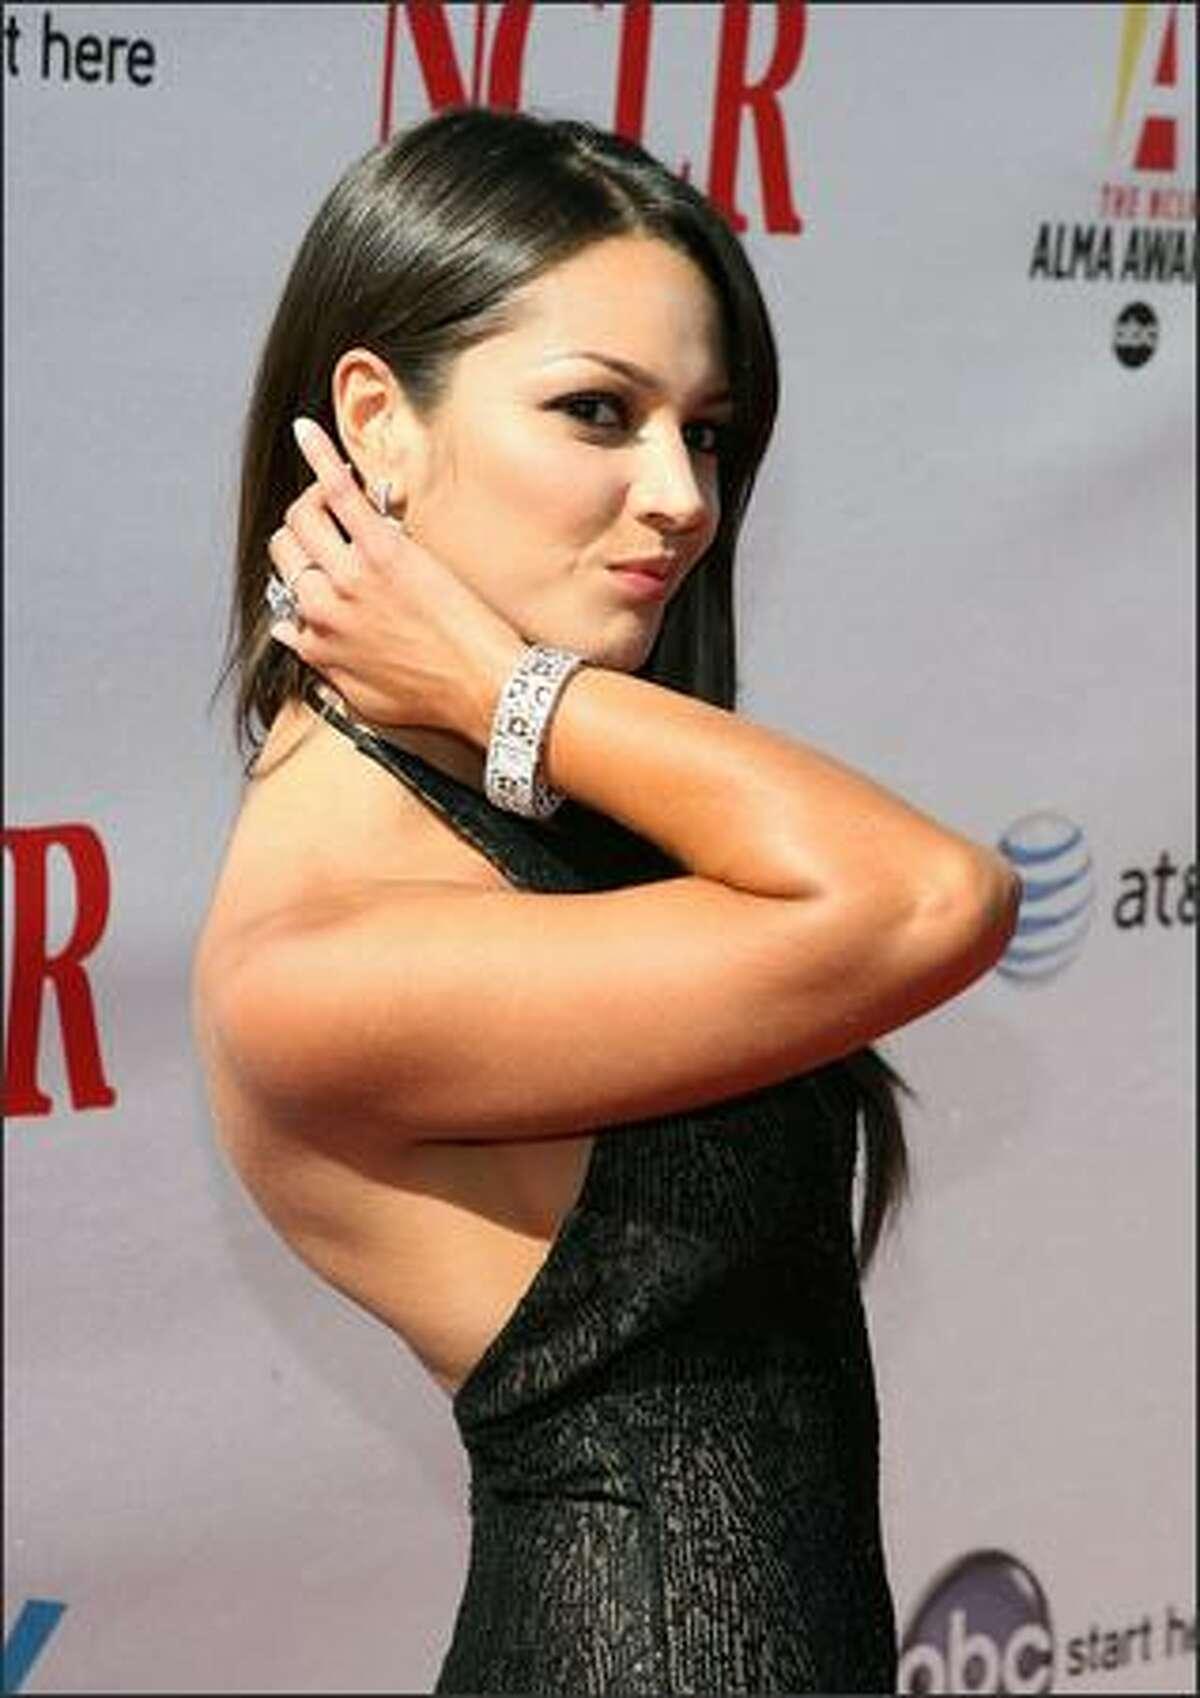 Actress Paula Garces arrives at the 2008 ALMA Awards at the Pasadena Civic Auditorium on Sunday in Pasadena, Calif.